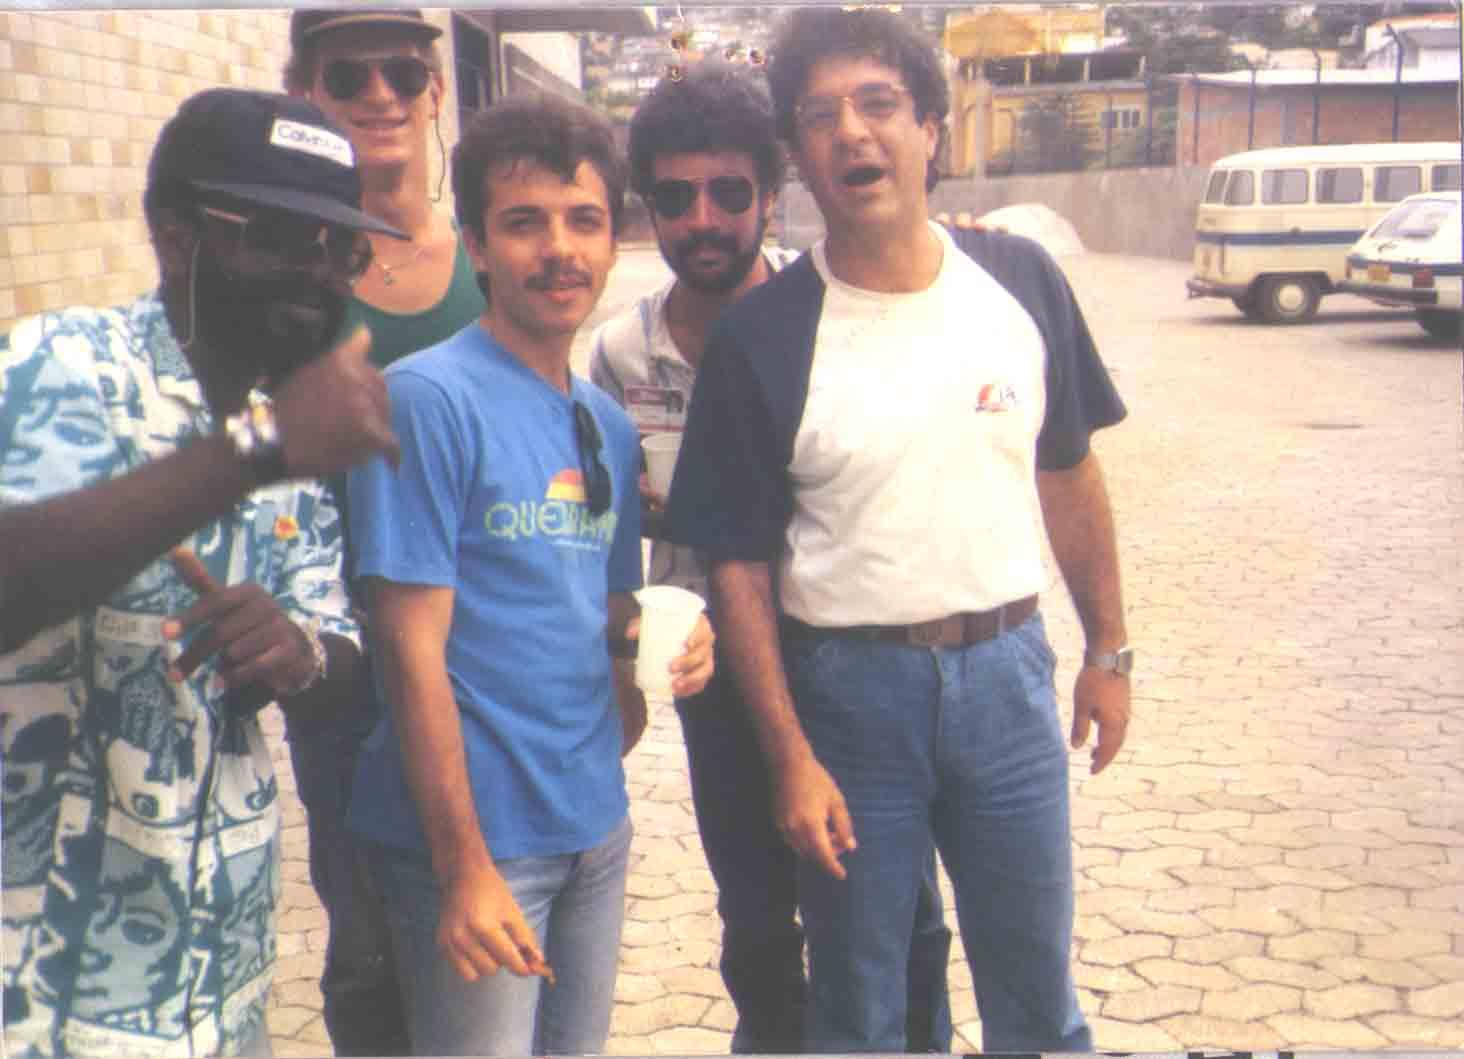 Zé Roberto Mignoni, Raimundo Fagner, Adilson Caetano e Coelho - Tribuna FM - 1981